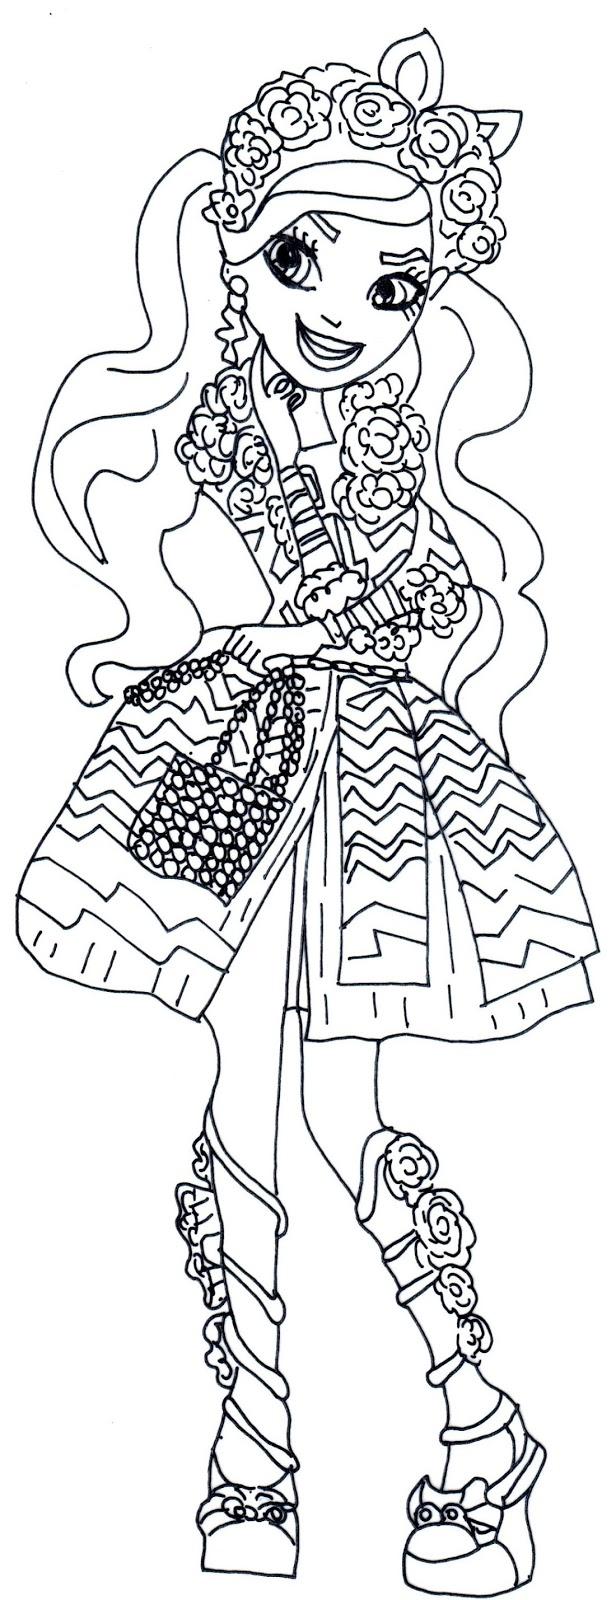 Desenho De Kitty Cheshire Para Colorir Tudodesenhos